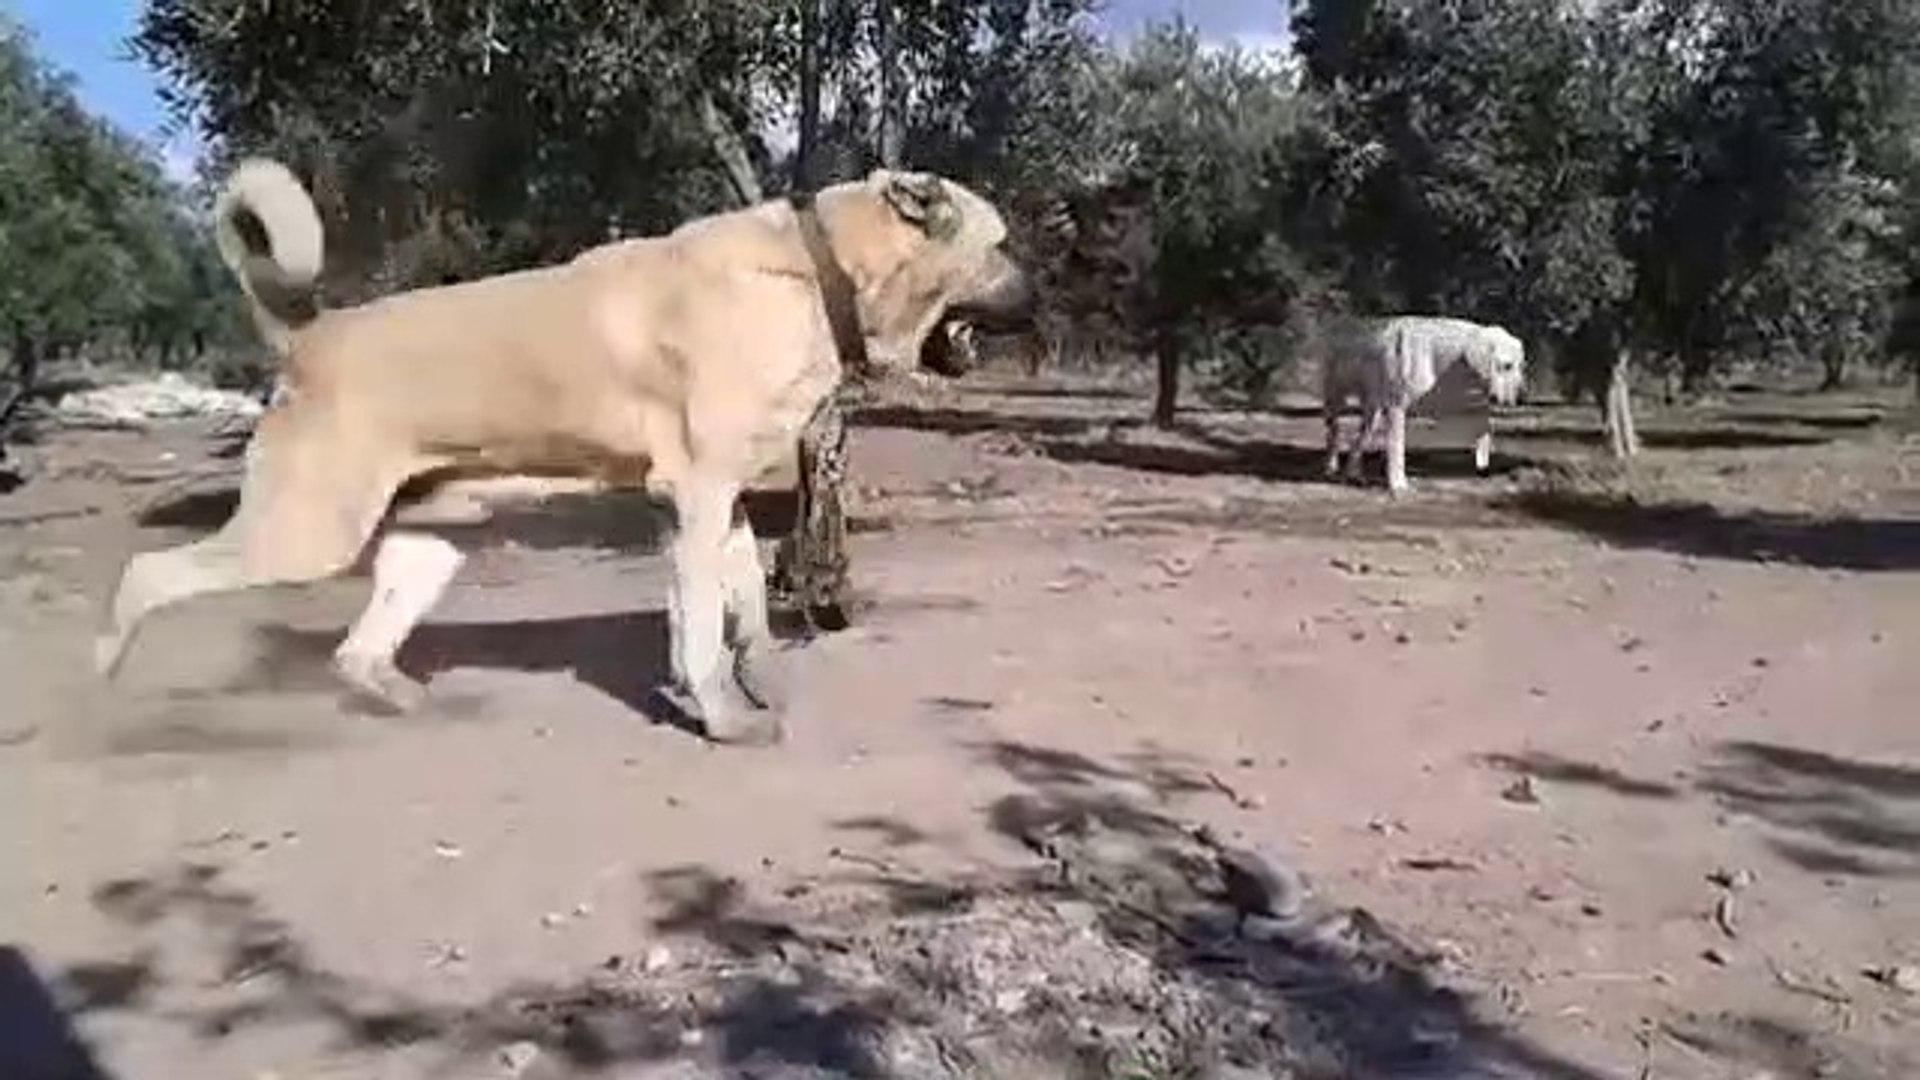 AKSARAY MALAKLI KOPEGi 4*4 - ANATOLiAN SHEPHERD DOG MALAKLI